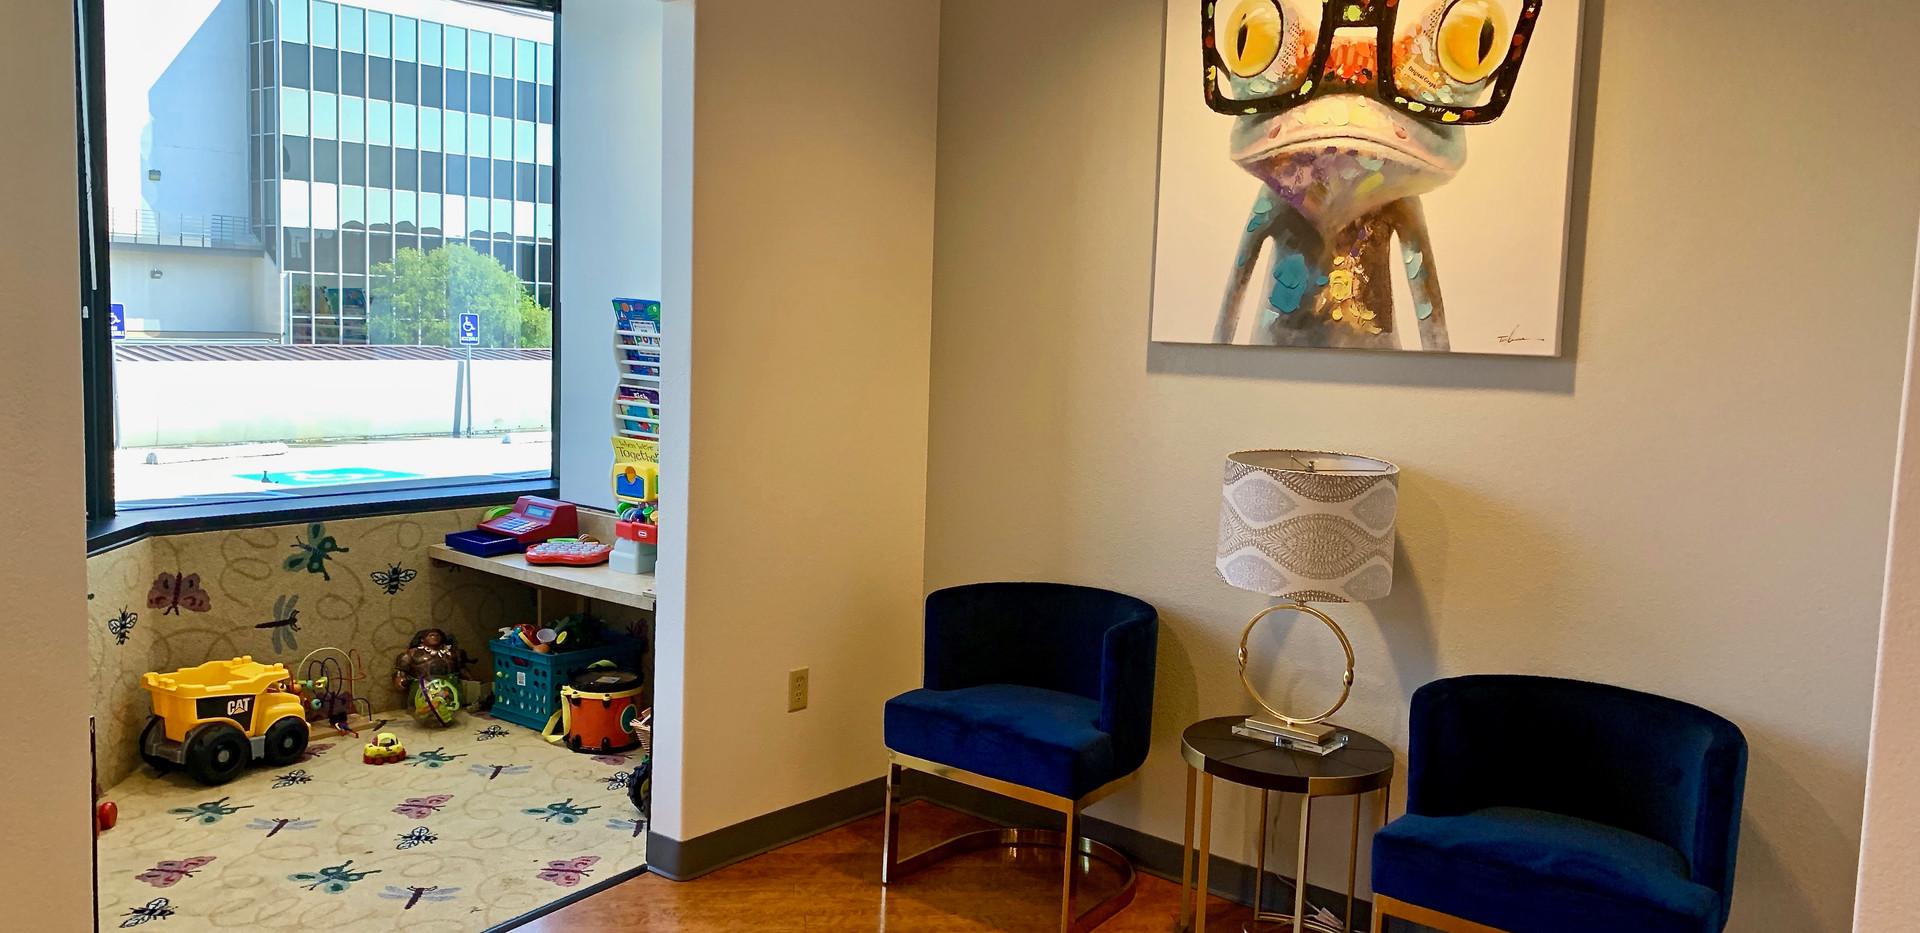 central-dentist-waiting-room-kids-area.j